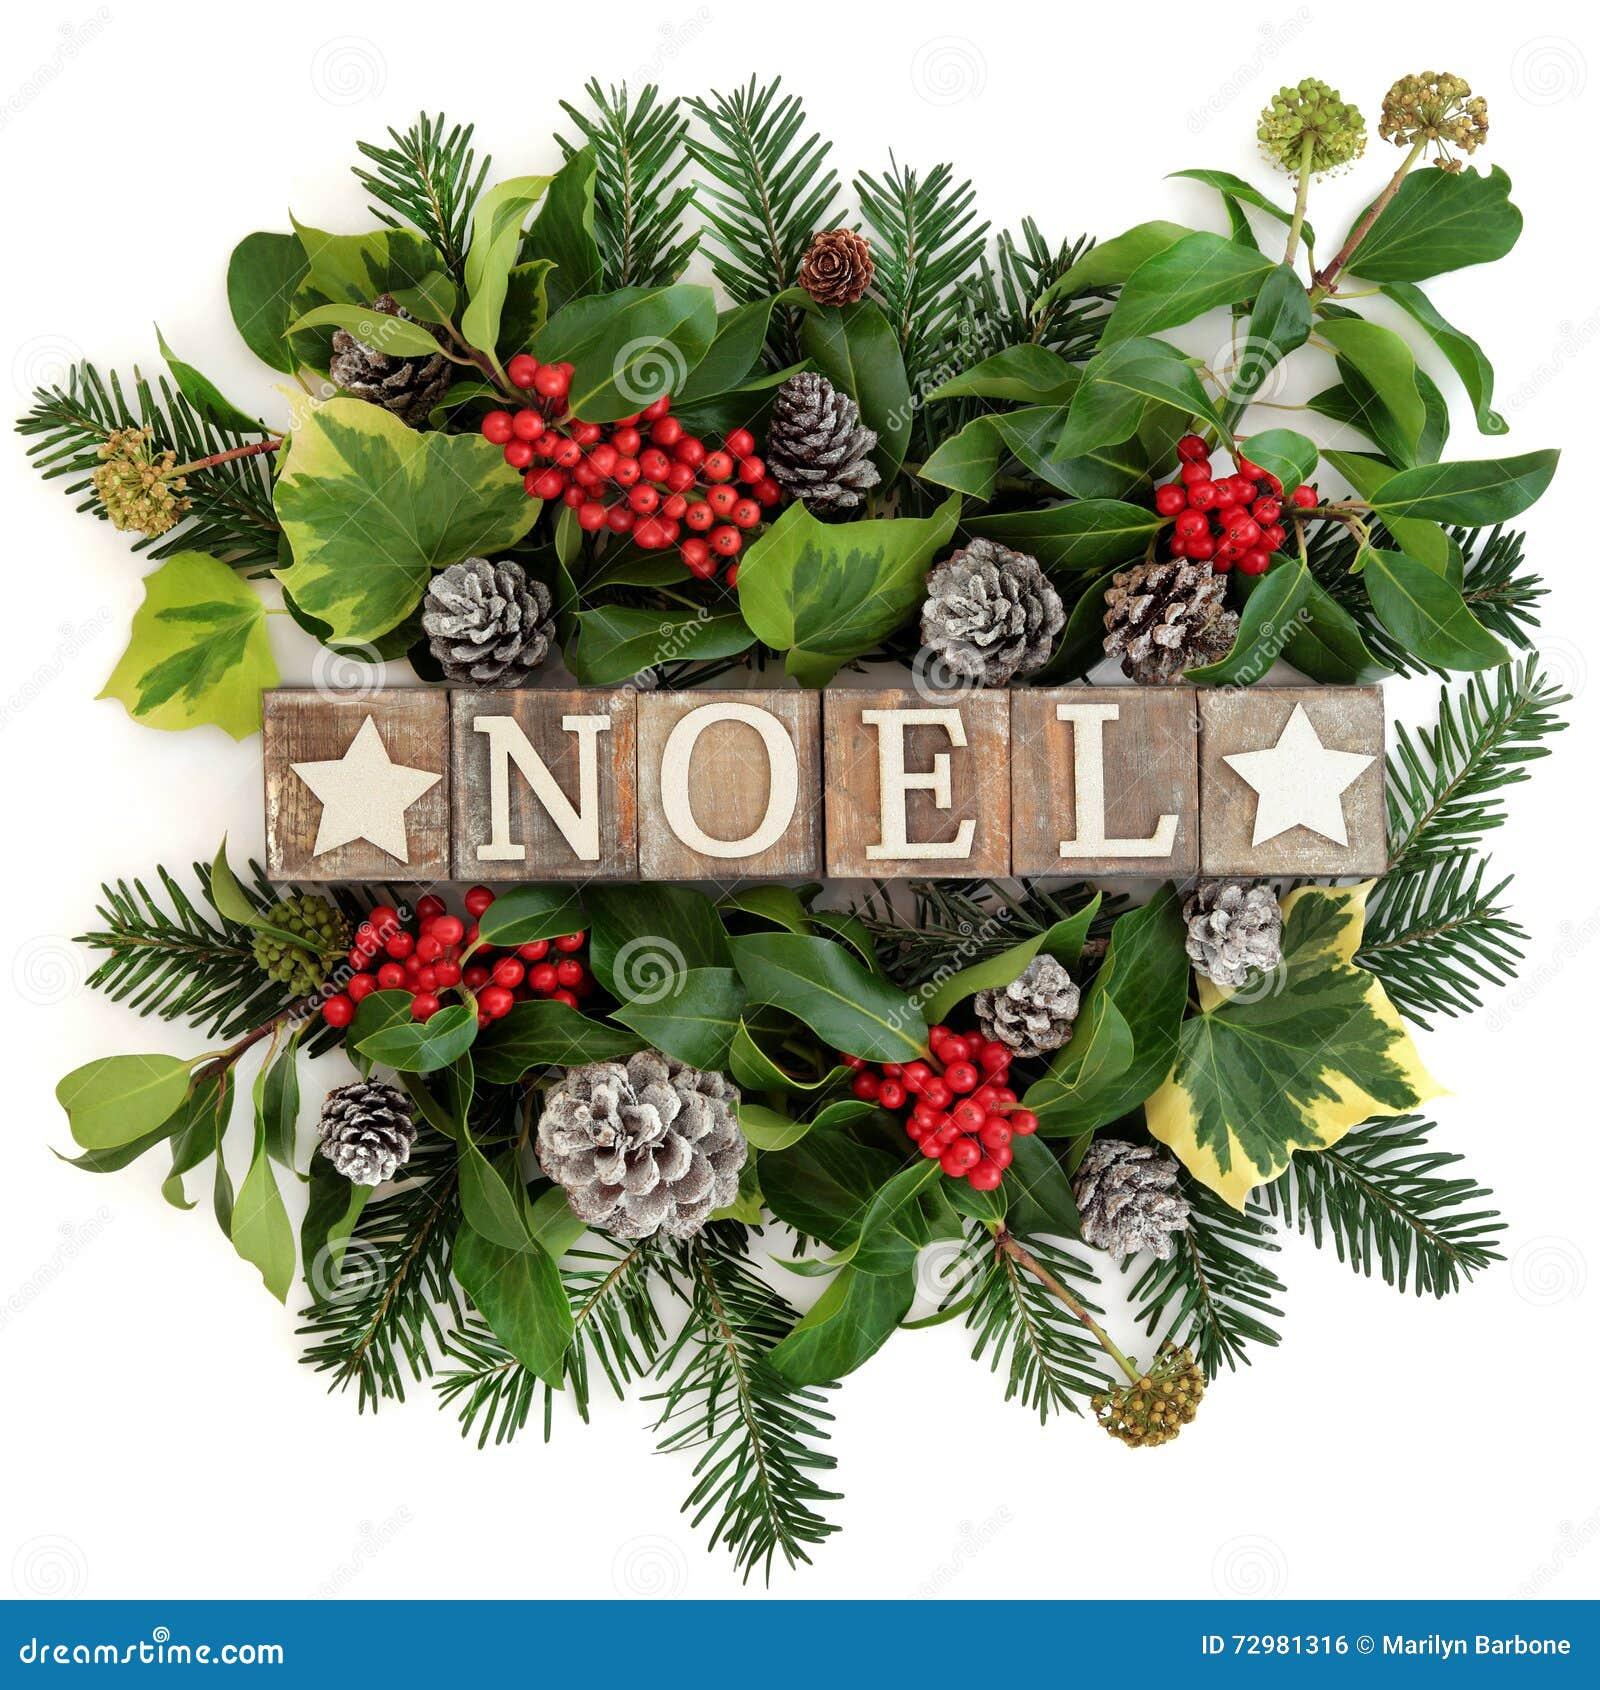 #AB2023 Noel Decoration Stock Photo Image: 72981316 6361 décoration noel commerce 1300x1390 px @ aertt.com